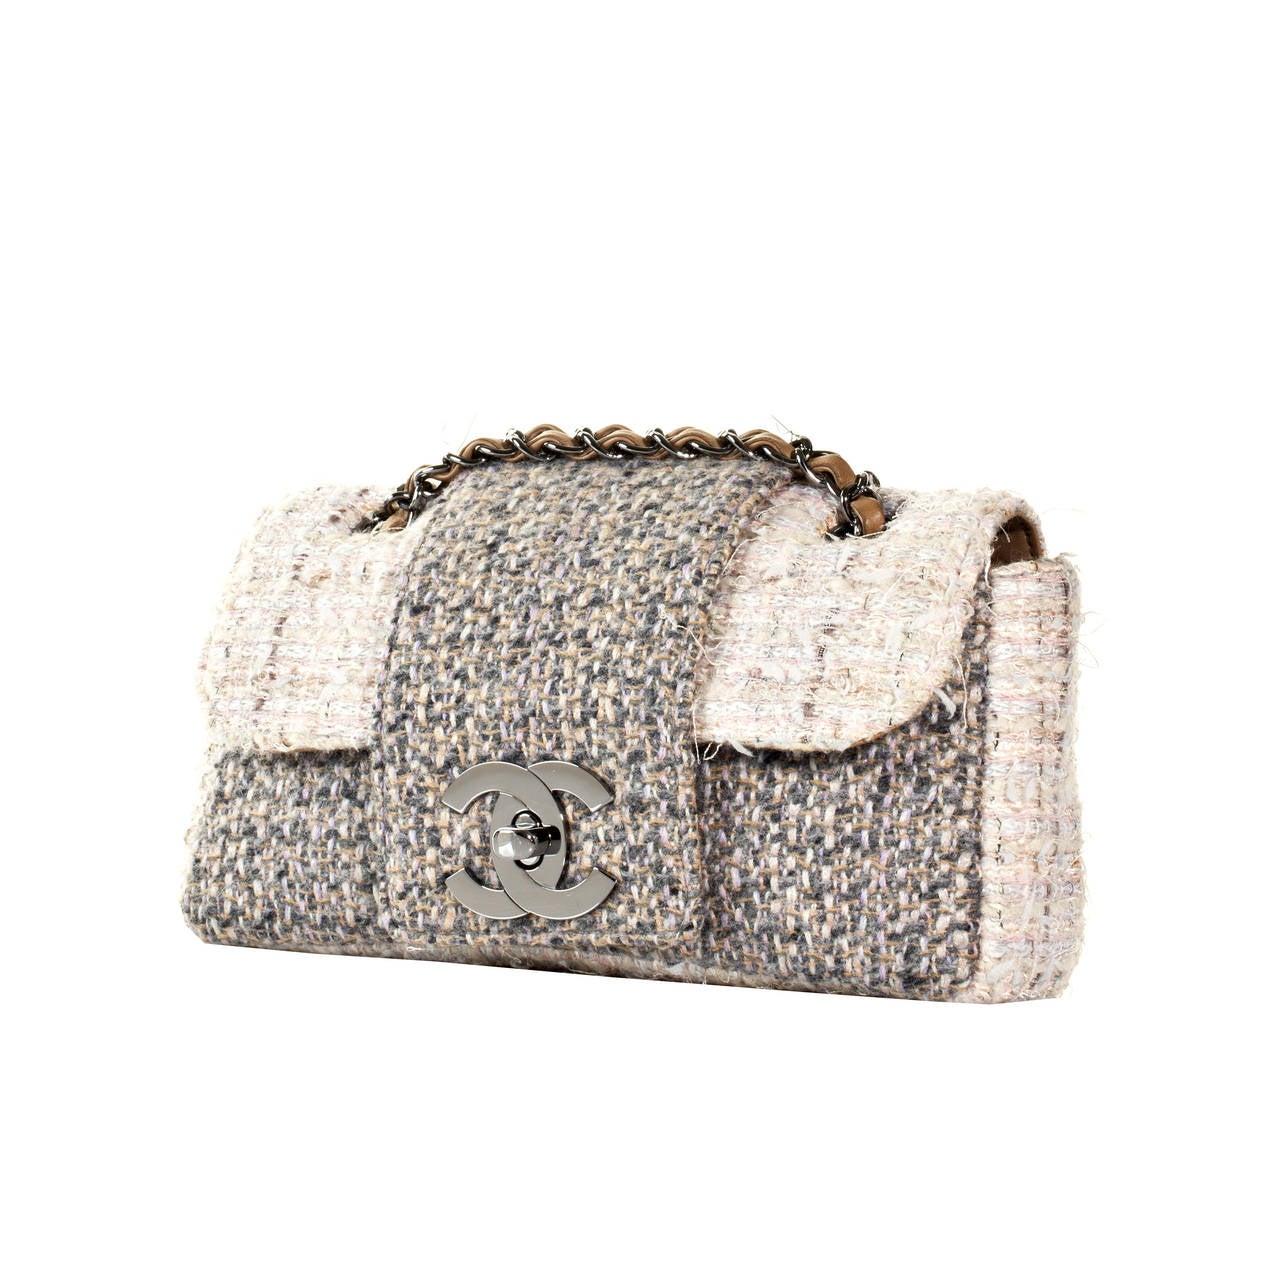 Chanel Fantasy Tweed Flap Bag 1